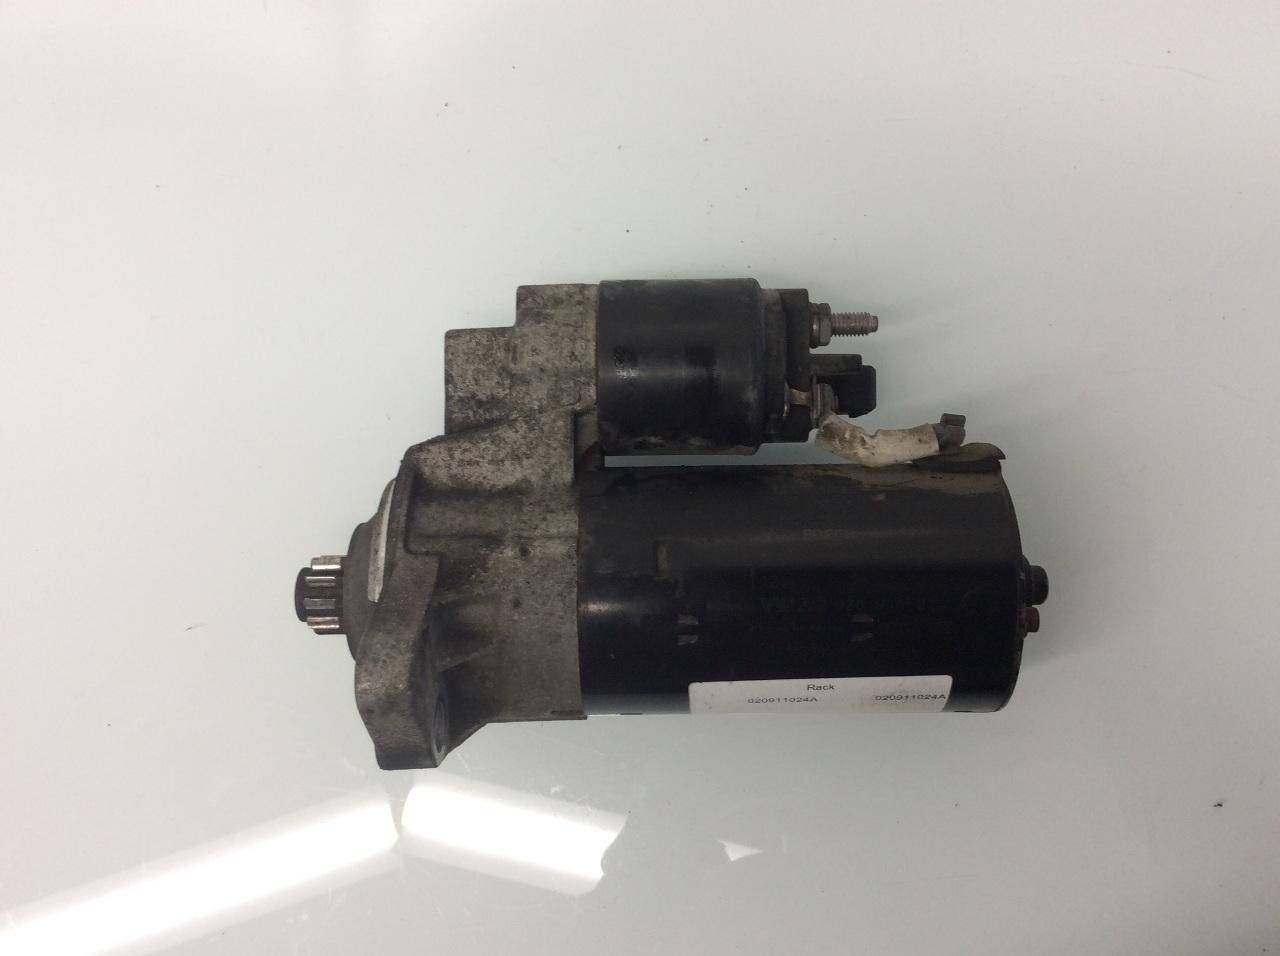 Clutch Pedal Switch Vw Jetta Golf Beetle Audi Tt Genuine Oe 1j0